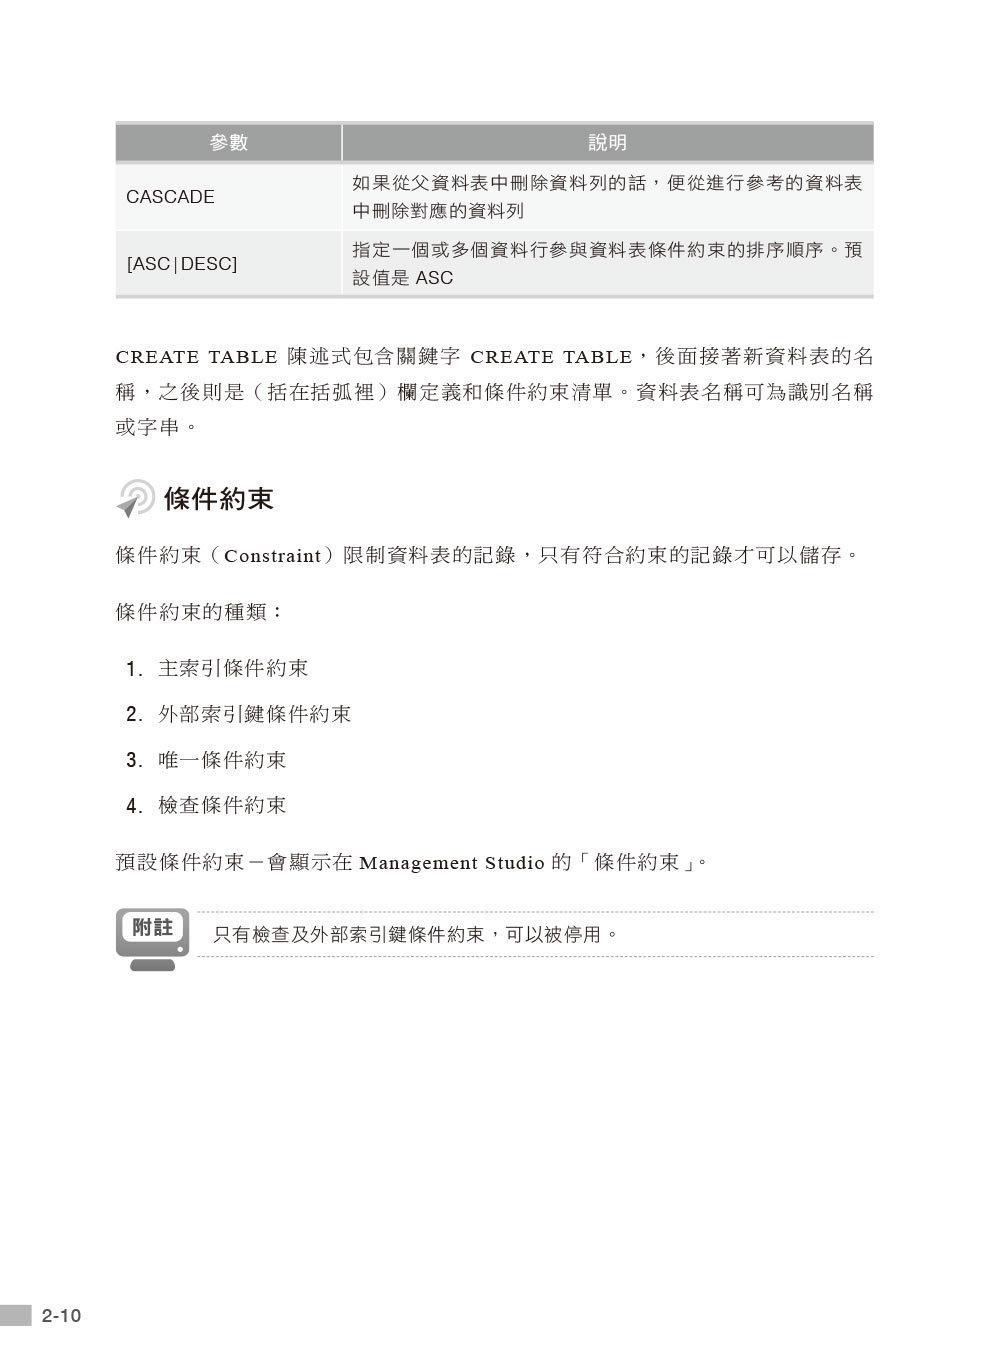 MTA Database Fundamentals 資料庫管理 國際認證教戰手冊 (98-364)-preview-12